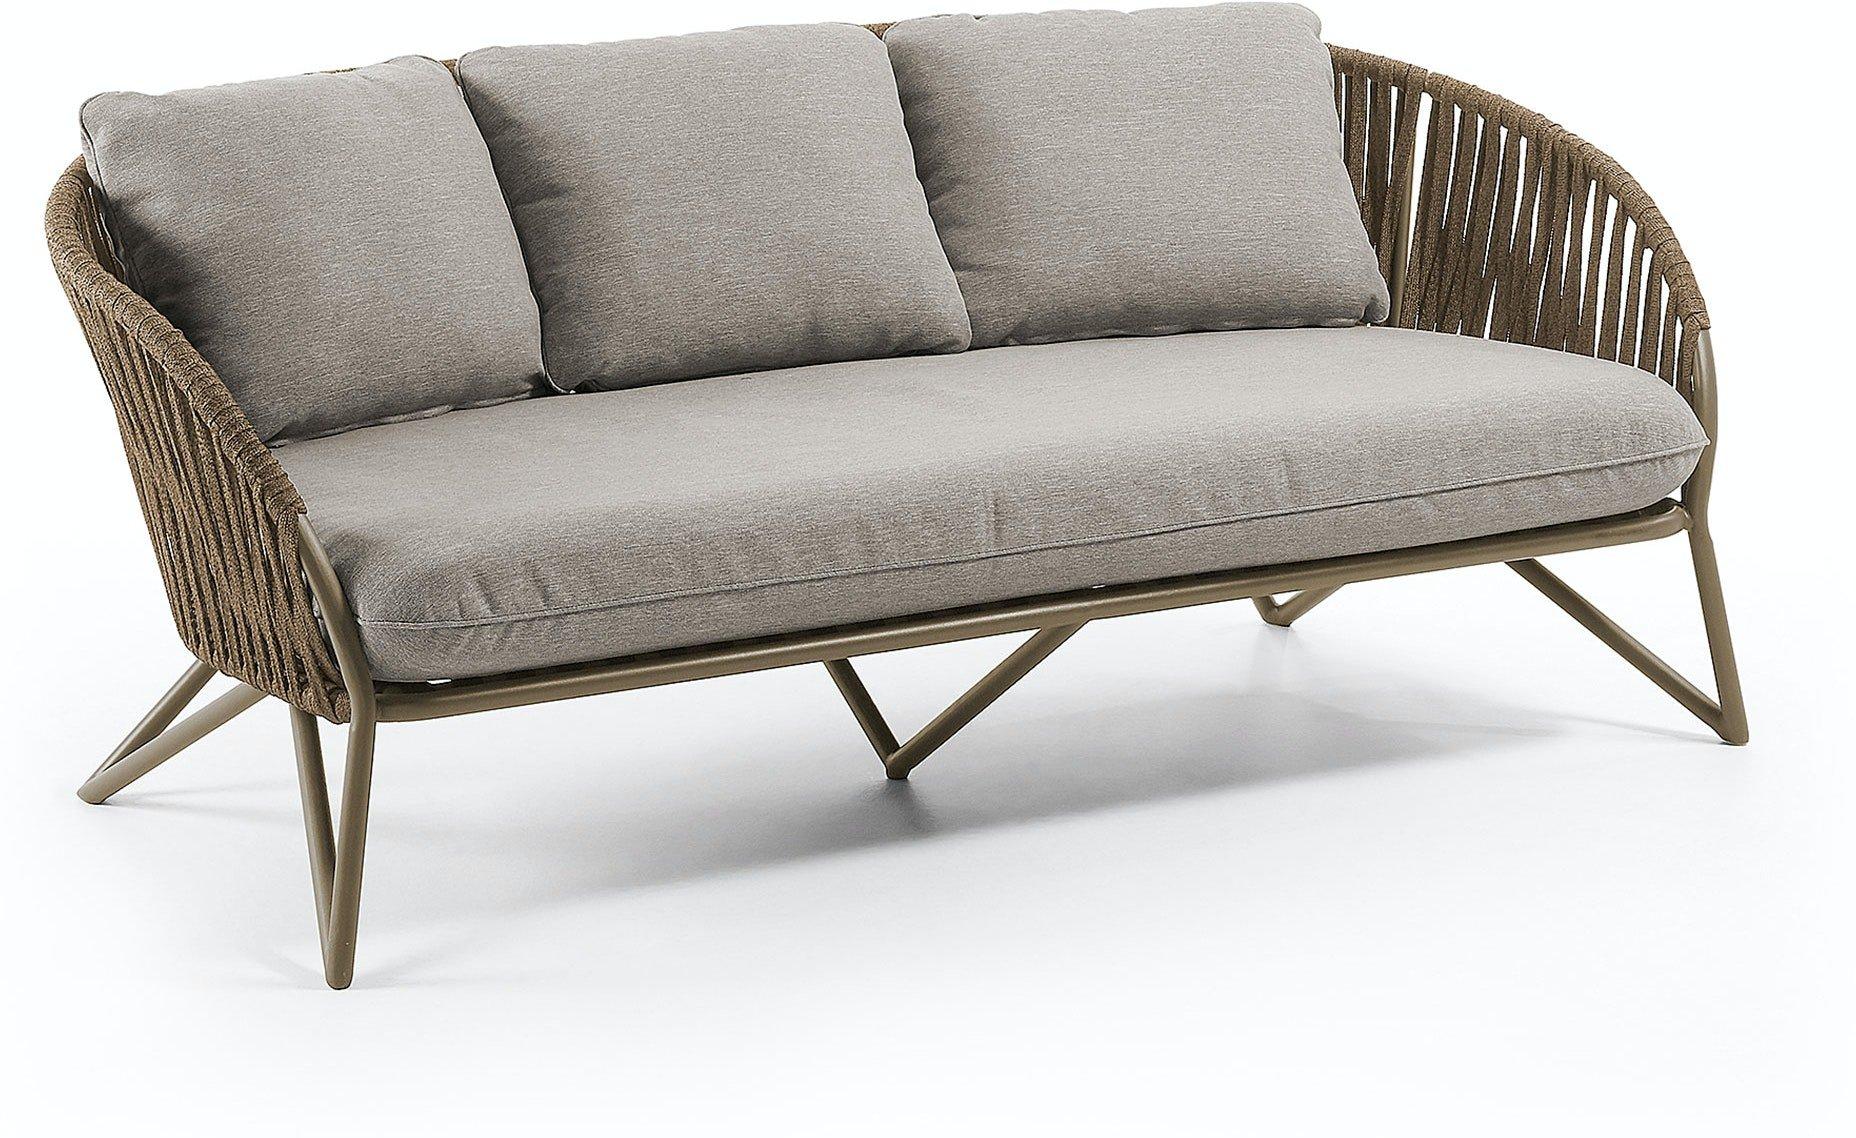 Branzie, Udendørs 3-personers sofa by LaForma (H: 77 cm. B: 180 cm. L: 90 cm., Brun/Grå)